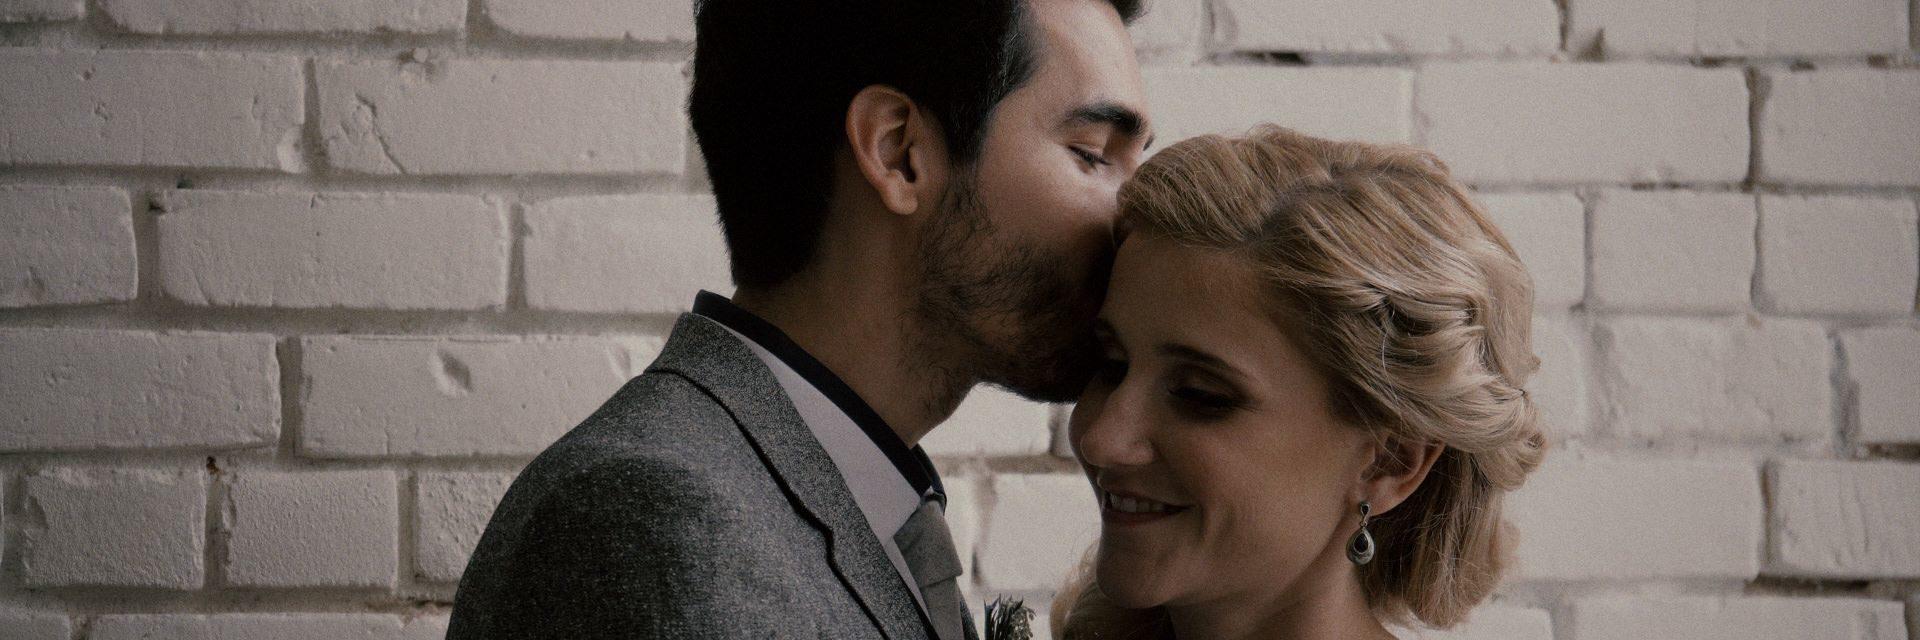 Stavanger-wedding-videographer-cinemate-films-03